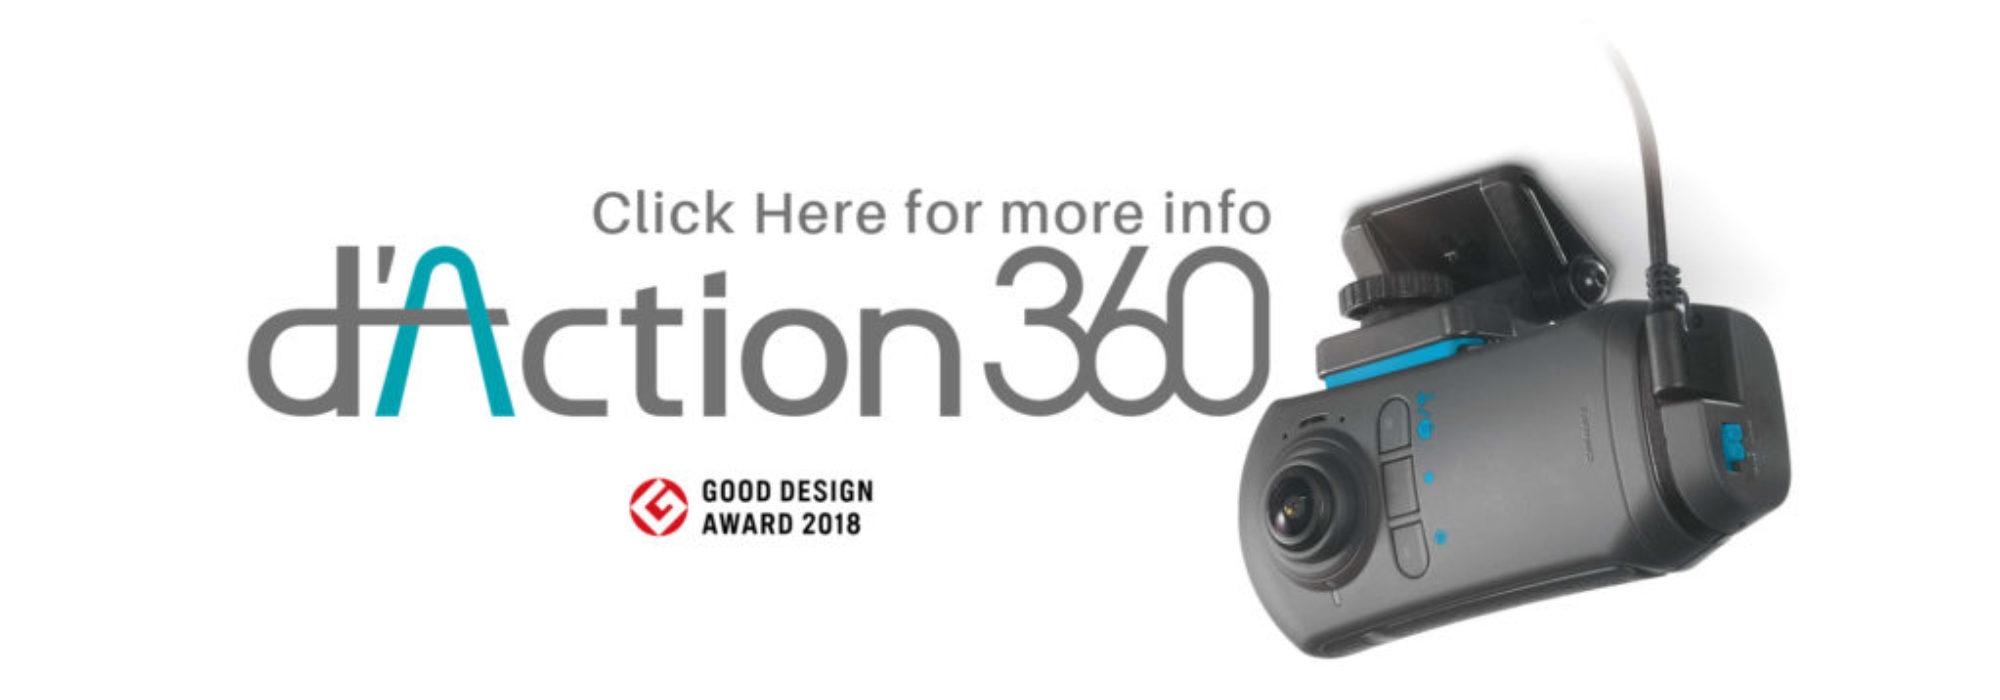 dAction 5000A sliderA